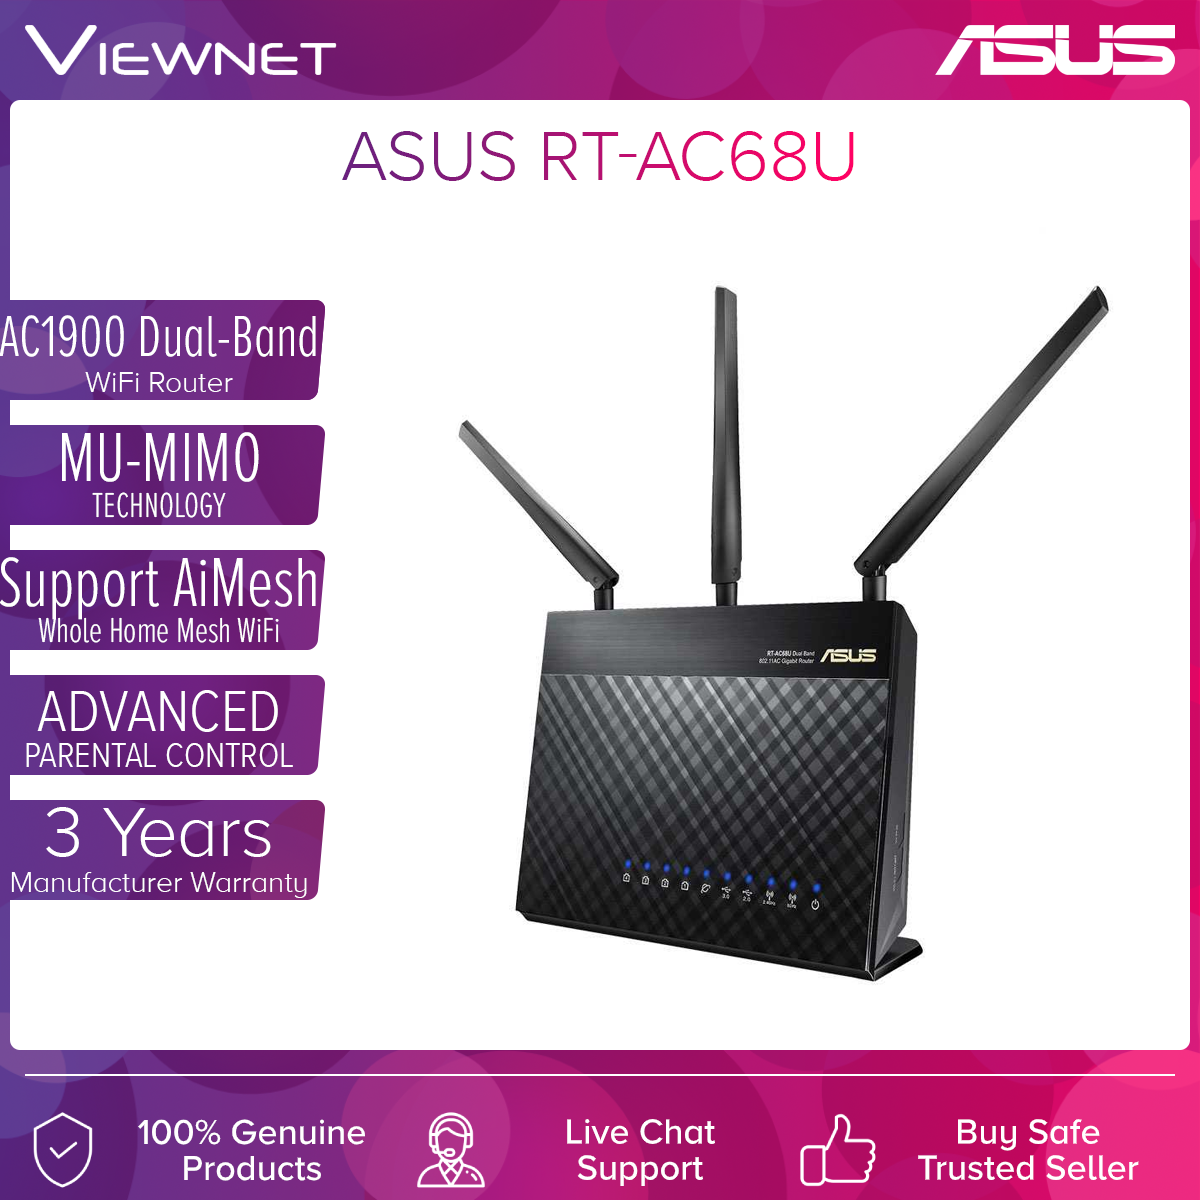 ASUS RT-AC68U AC1900 Gigabit Dual Band WiFi Router Wireless AC 2.4GHz + 5GHz AiMesh (Mesh WiFi) UniFi / MAXIS Fiber / Time Fibre